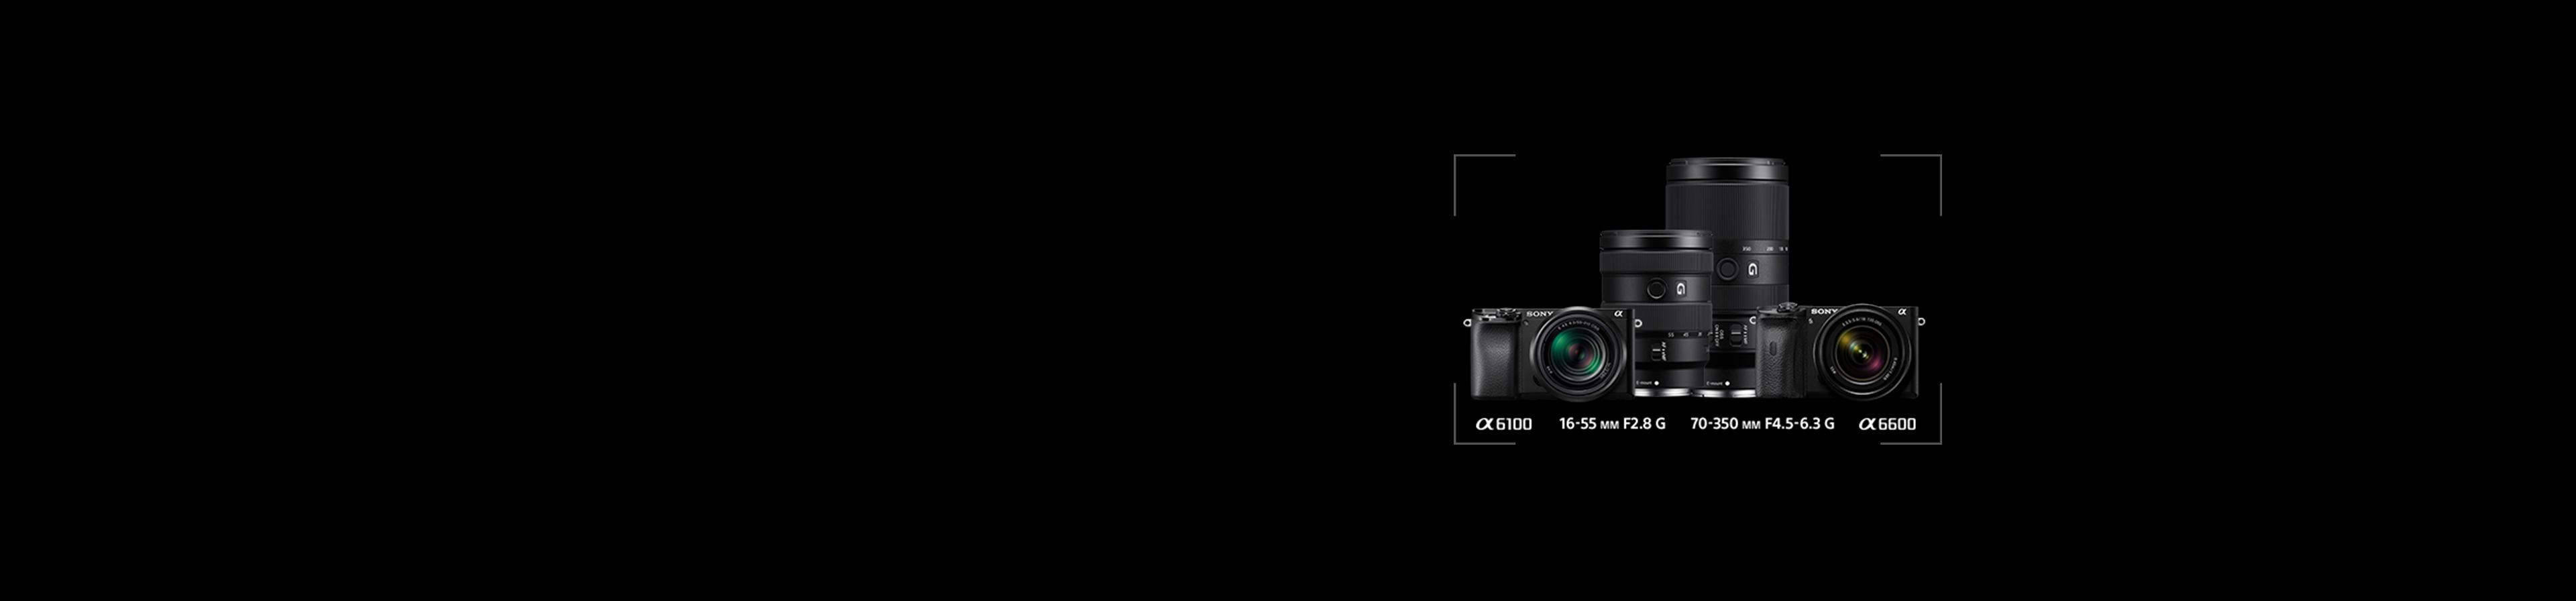 Fotga 67mm Ultra Slim UV Ultra-Violet Lens Protector Filter with MC Multi-Coated for Canon Nikon Sony Pentax Olympus Panasonic Fujifilm Leica Ricoh Samsung DSLR Cameras